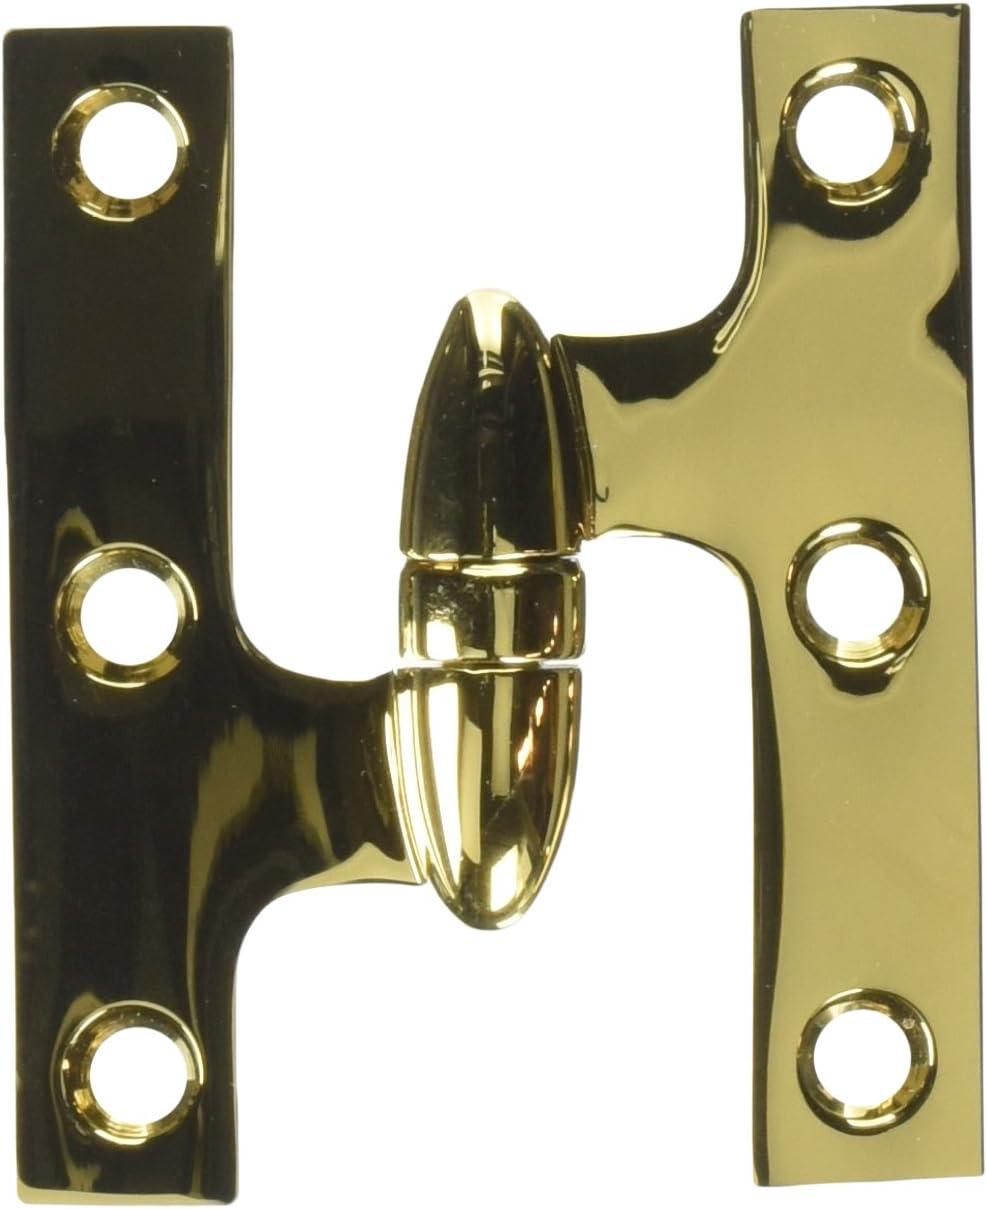 Deltana OK3025BCR003-L Solid Brass 3-Inch x 2 Knu 毎日続々入荷 2-Inch 1 Olive 超定番